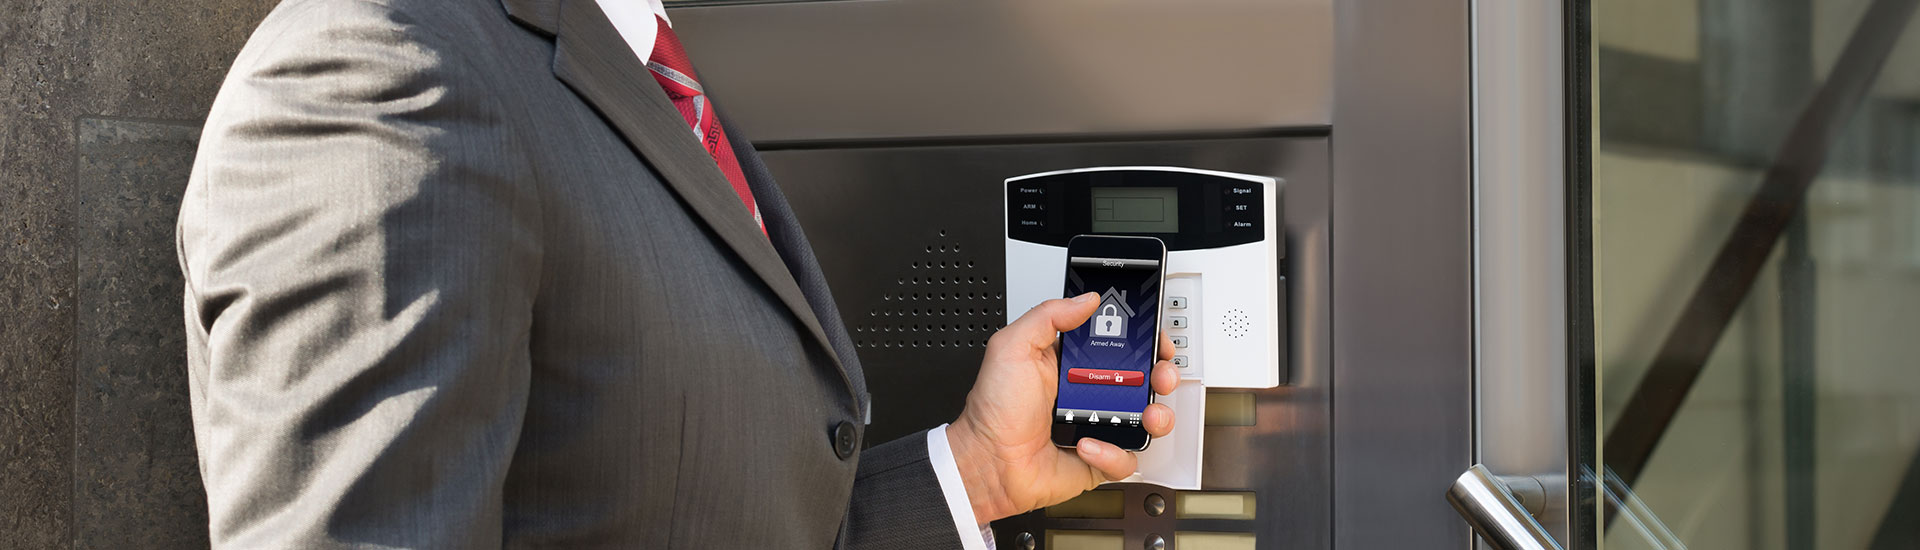 Alarm Systems in Brunswick GA, Hinesville GA, Pooler